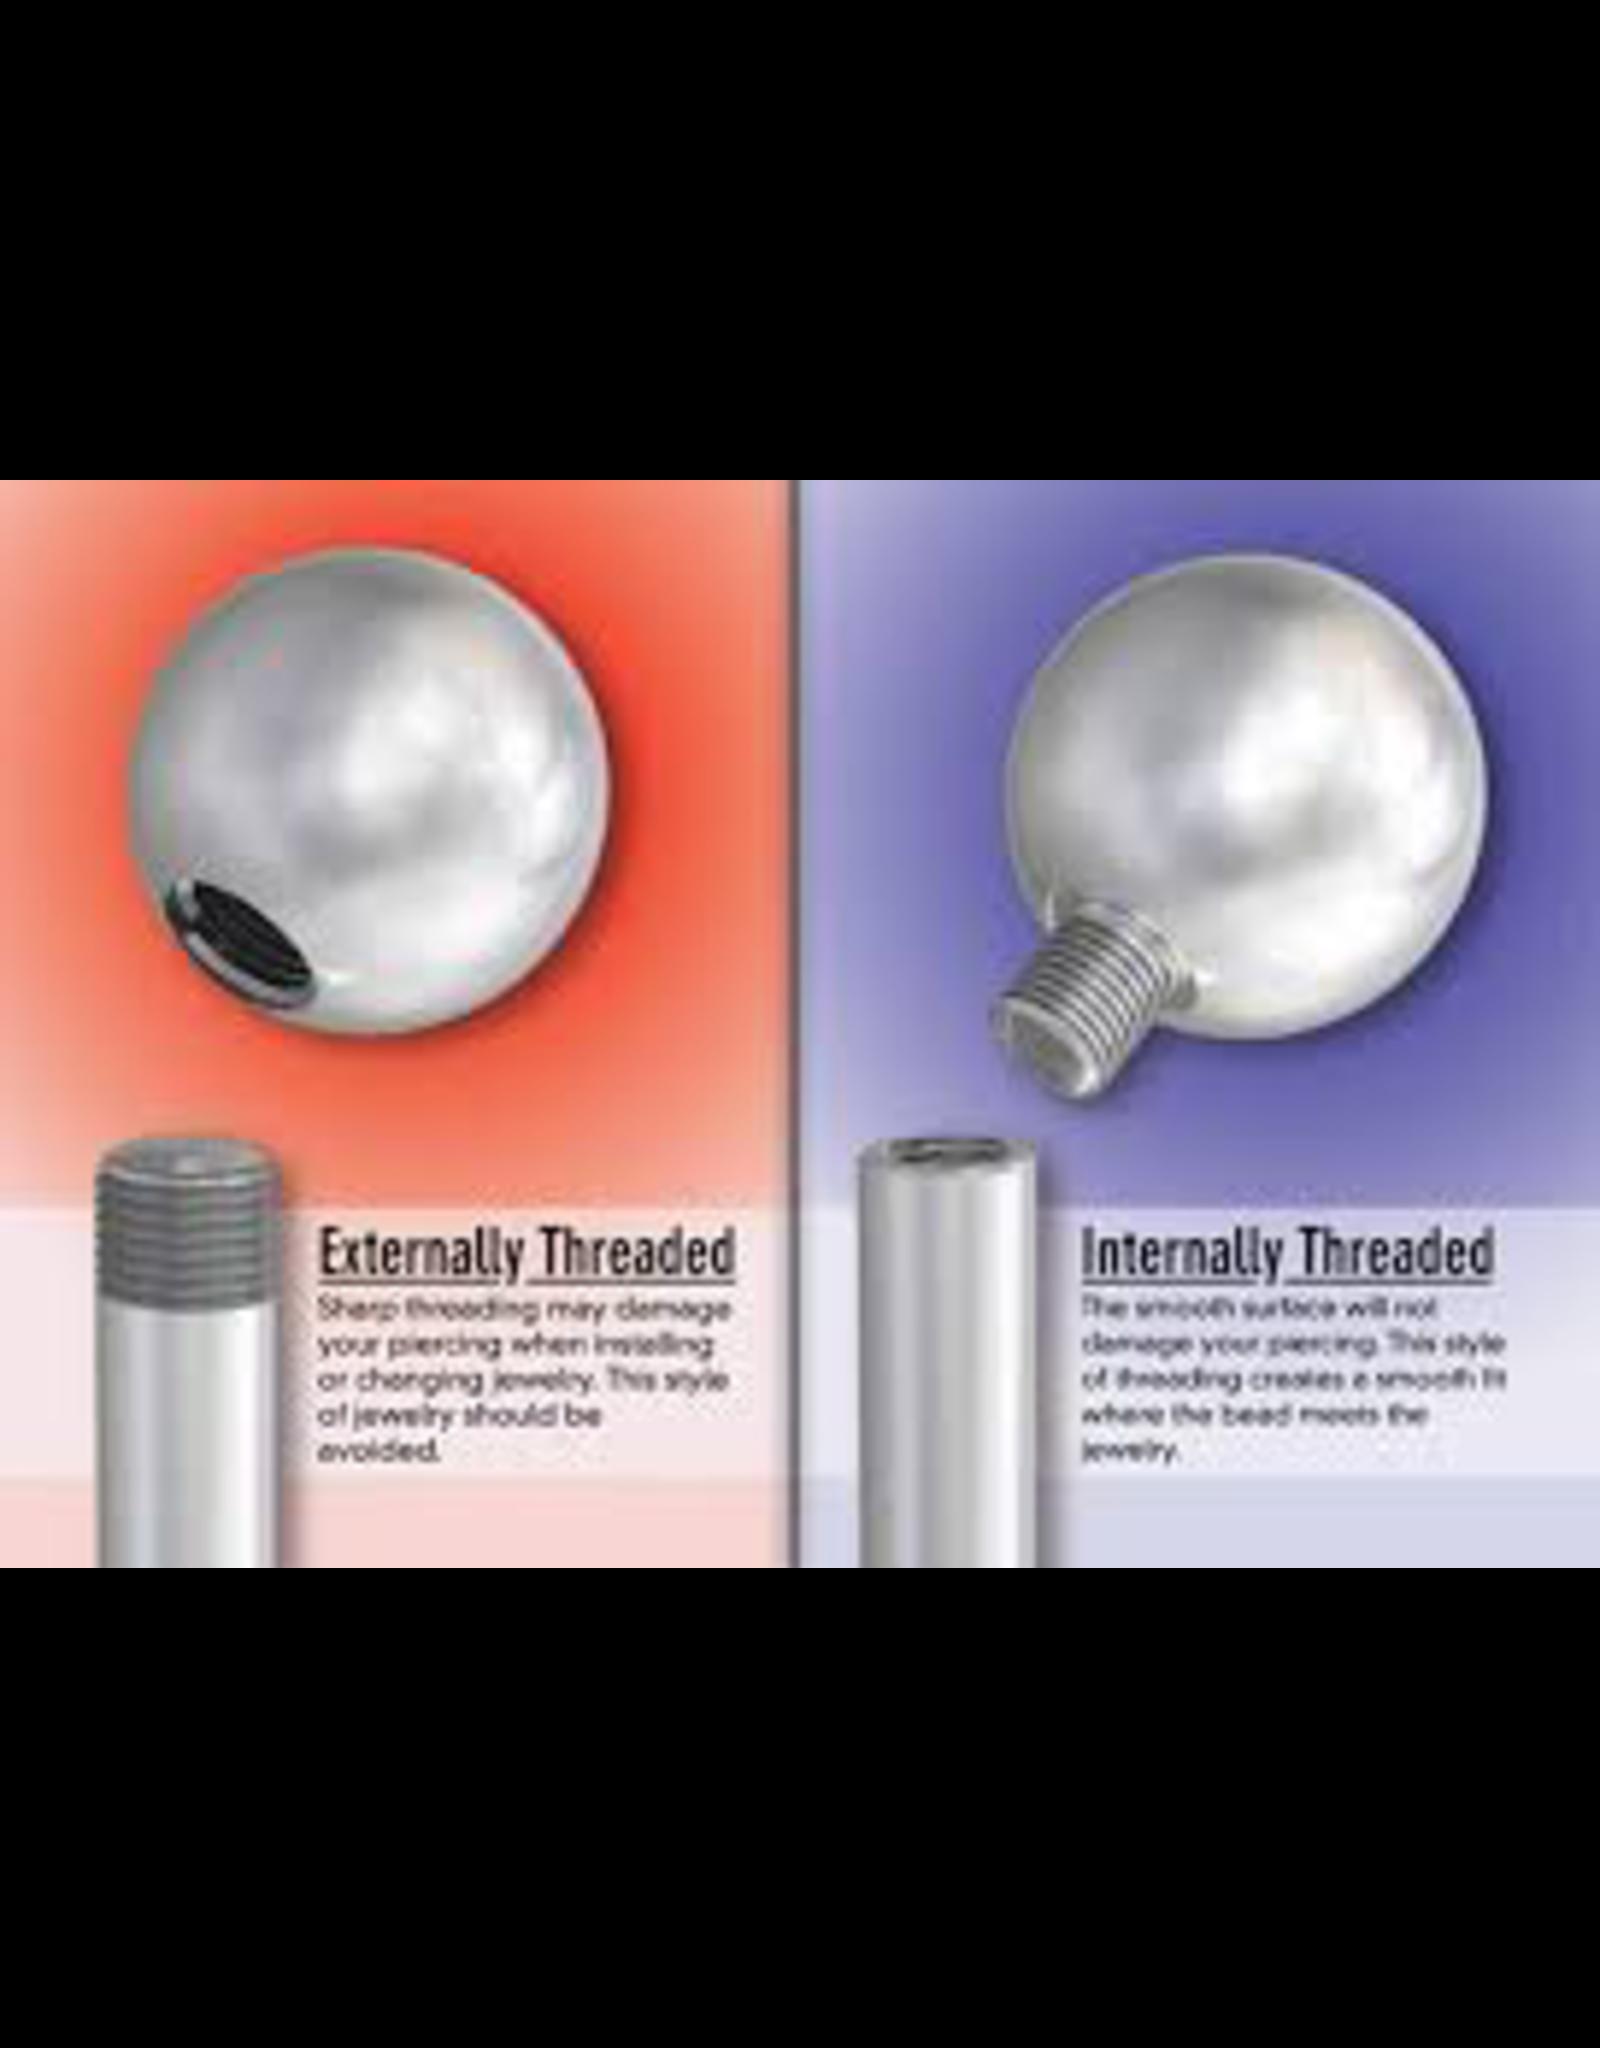 14g Titanium Internally Threaded Circular Barbell